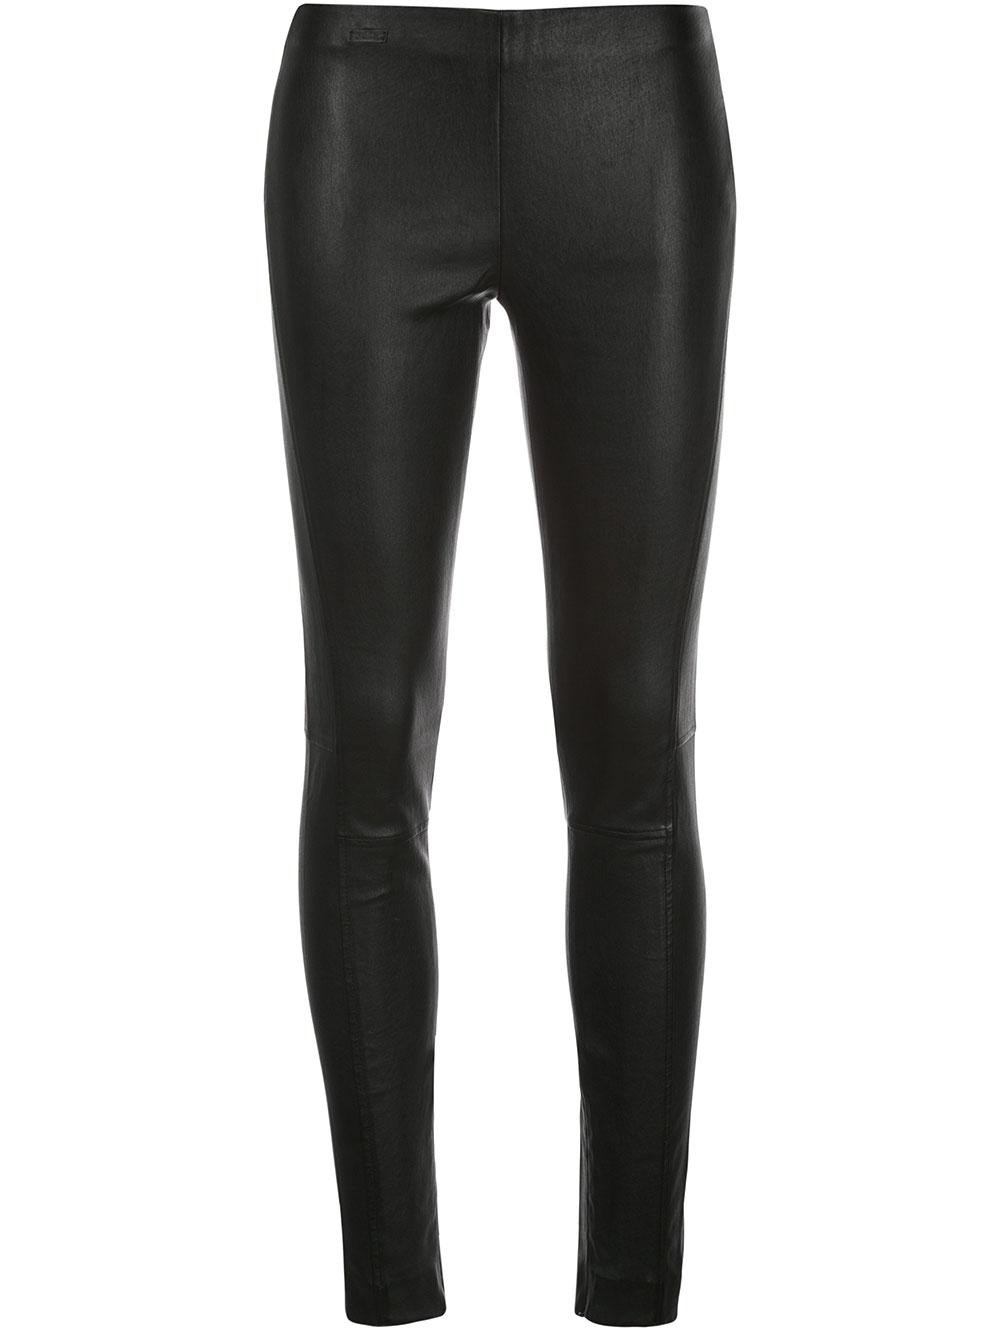 Leather Straight Slim Pant Item # 211525227001